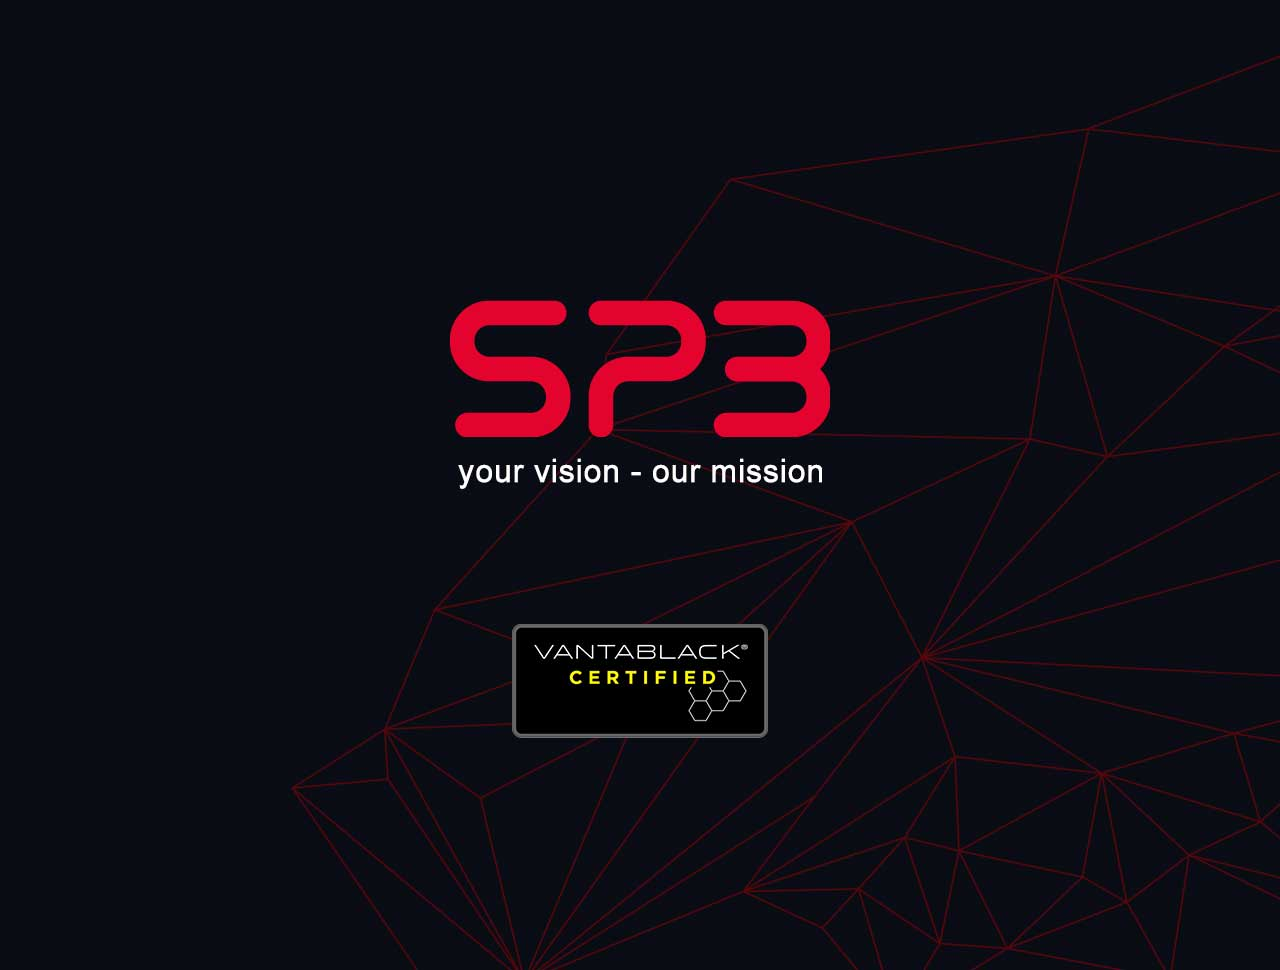 SP3 Schurer Projekte Prototypen Produkte GmbH Mobile Background